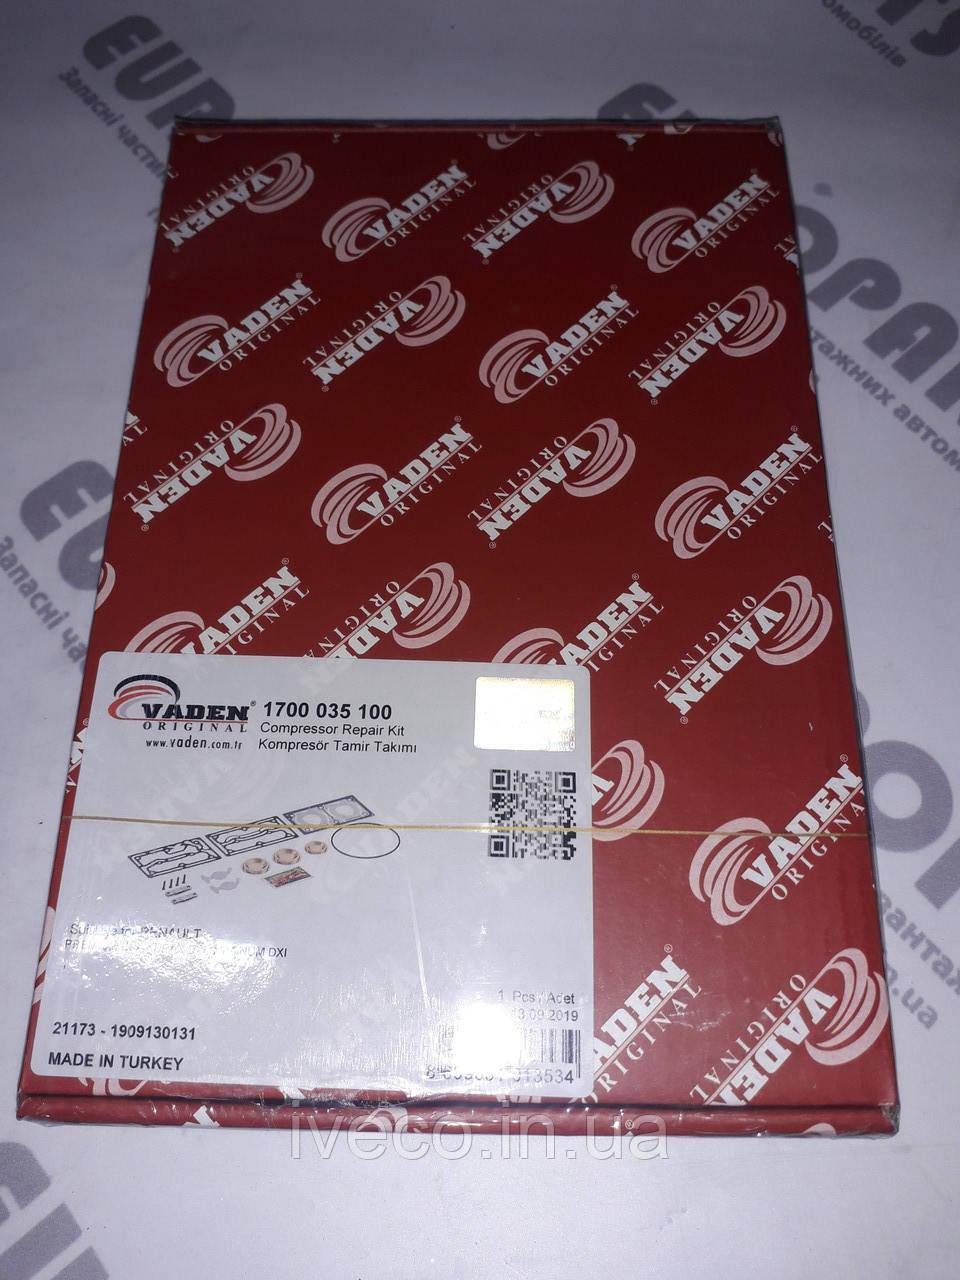 Ремкомплект компрессора Renault Premium RVI VOLVO 1700035100 Vaden 20733968 7421353473 9125140030 9125140040